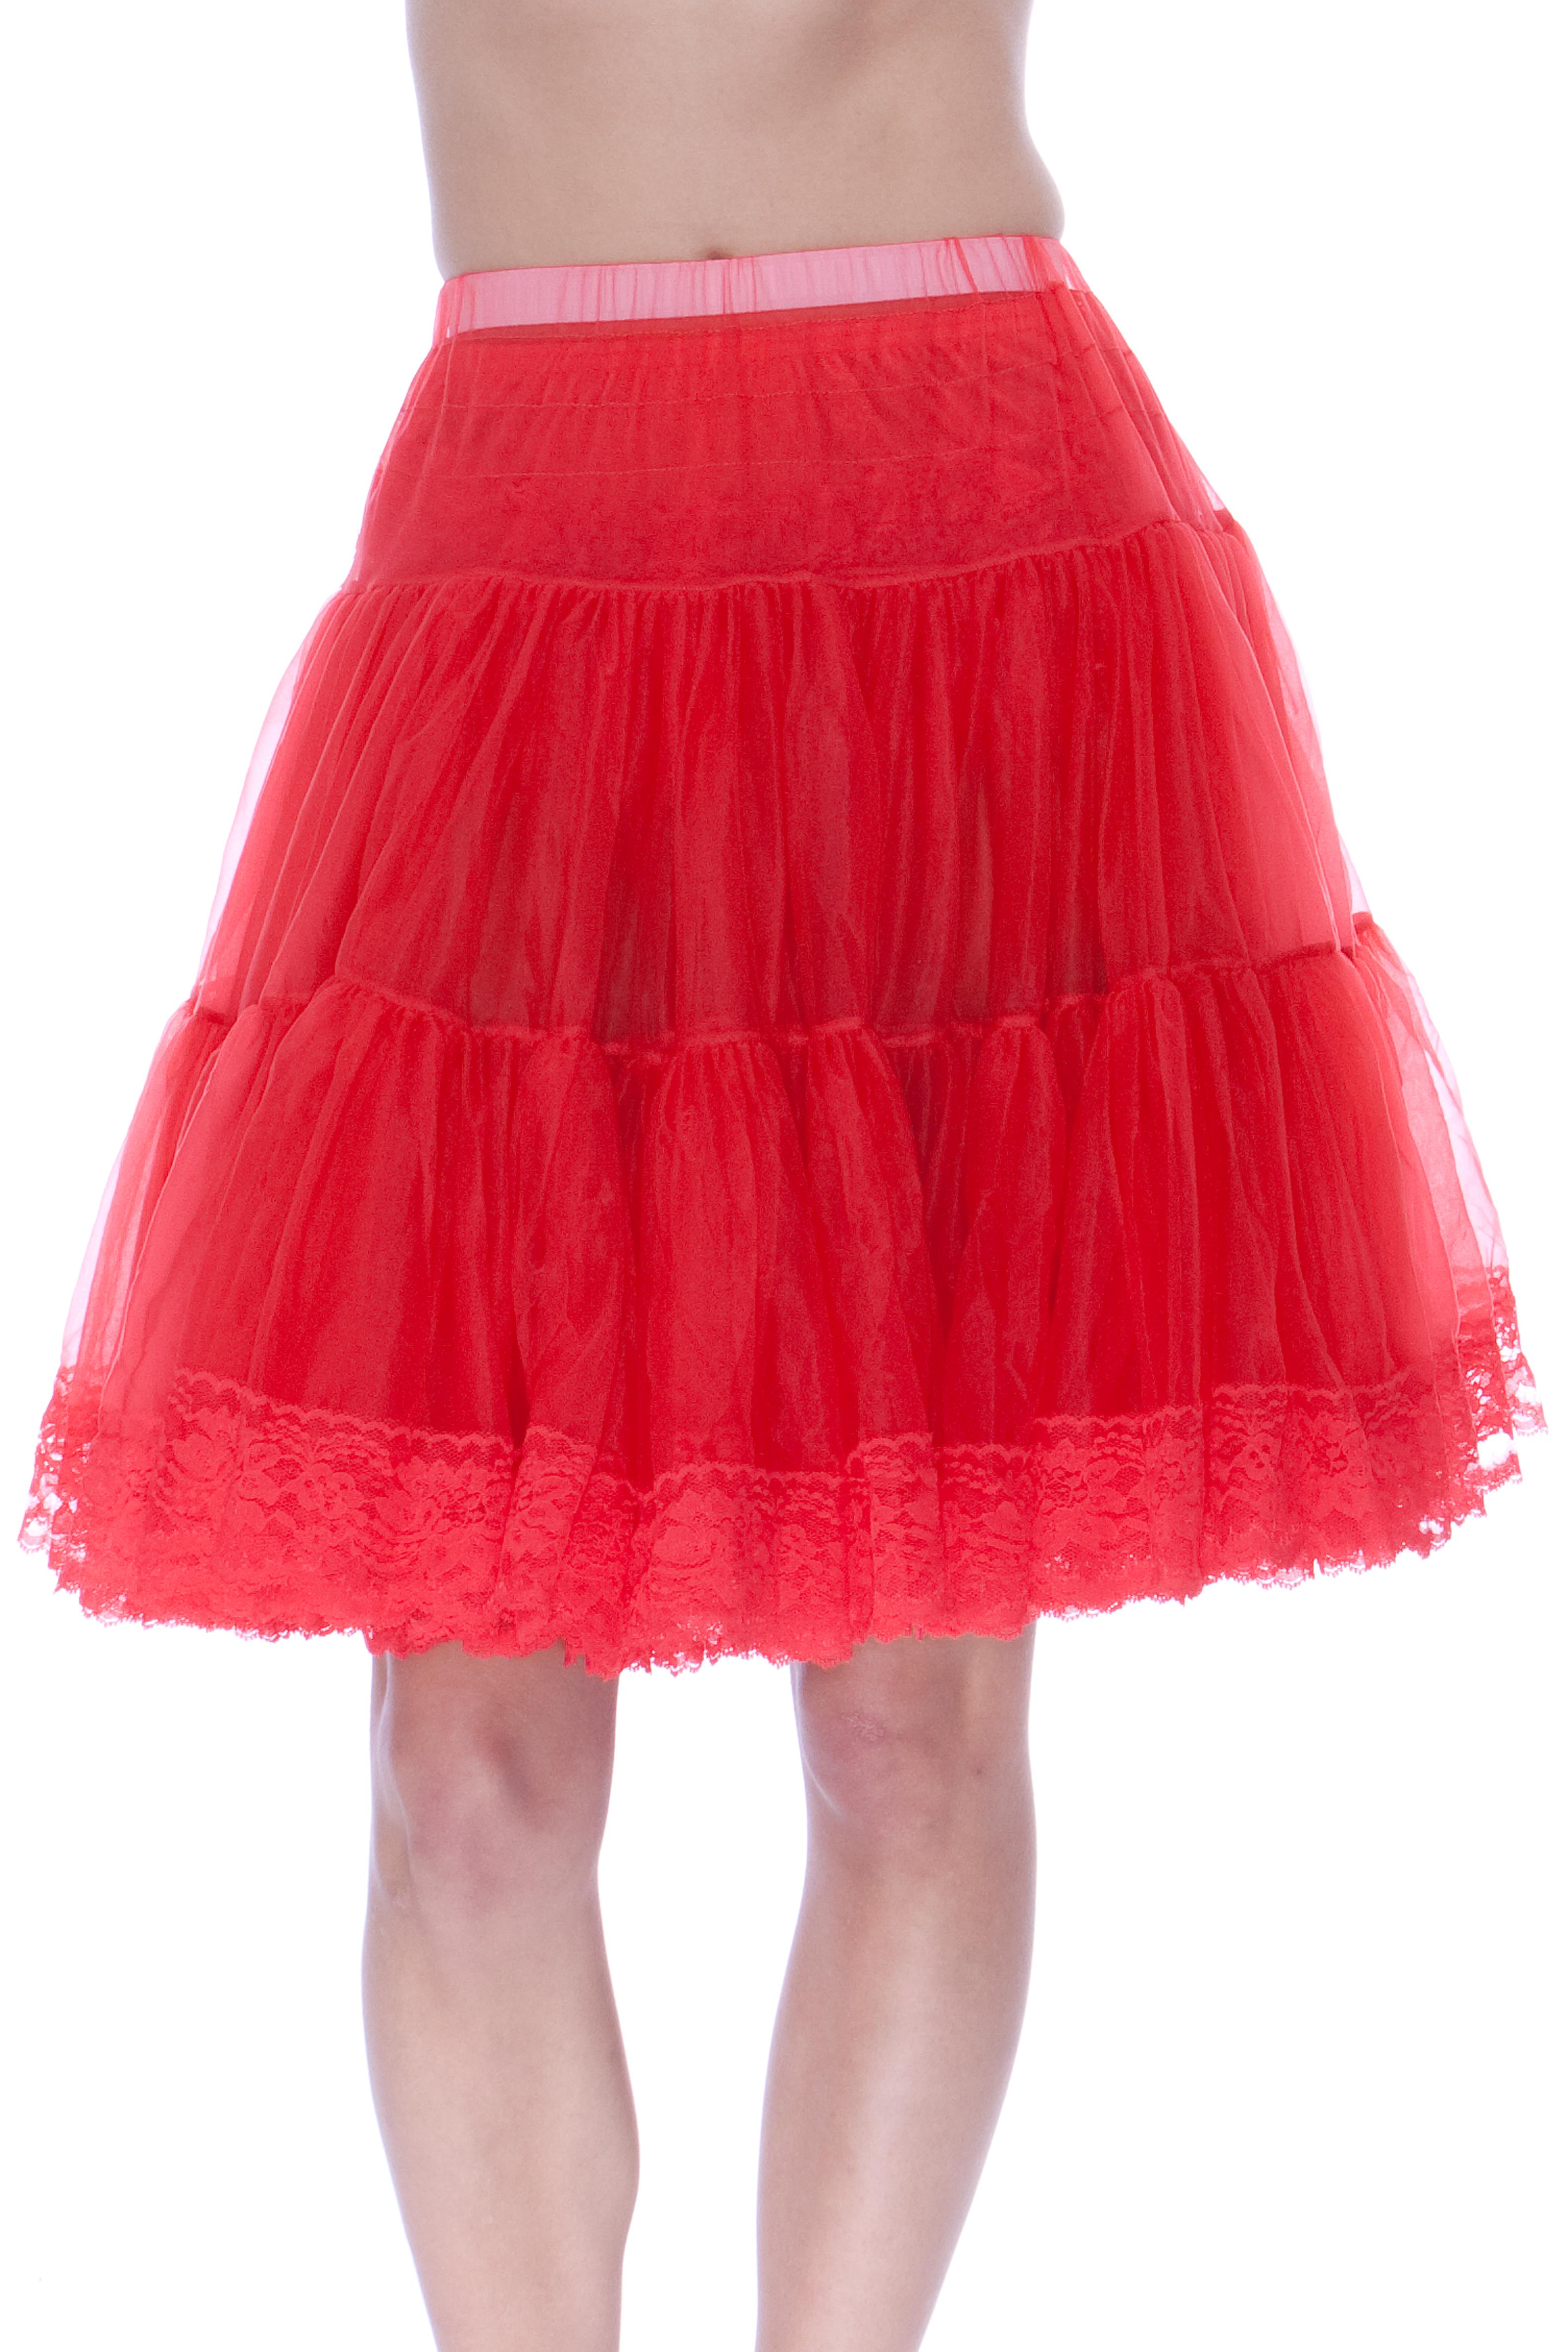 how to make a chiffon petticoat